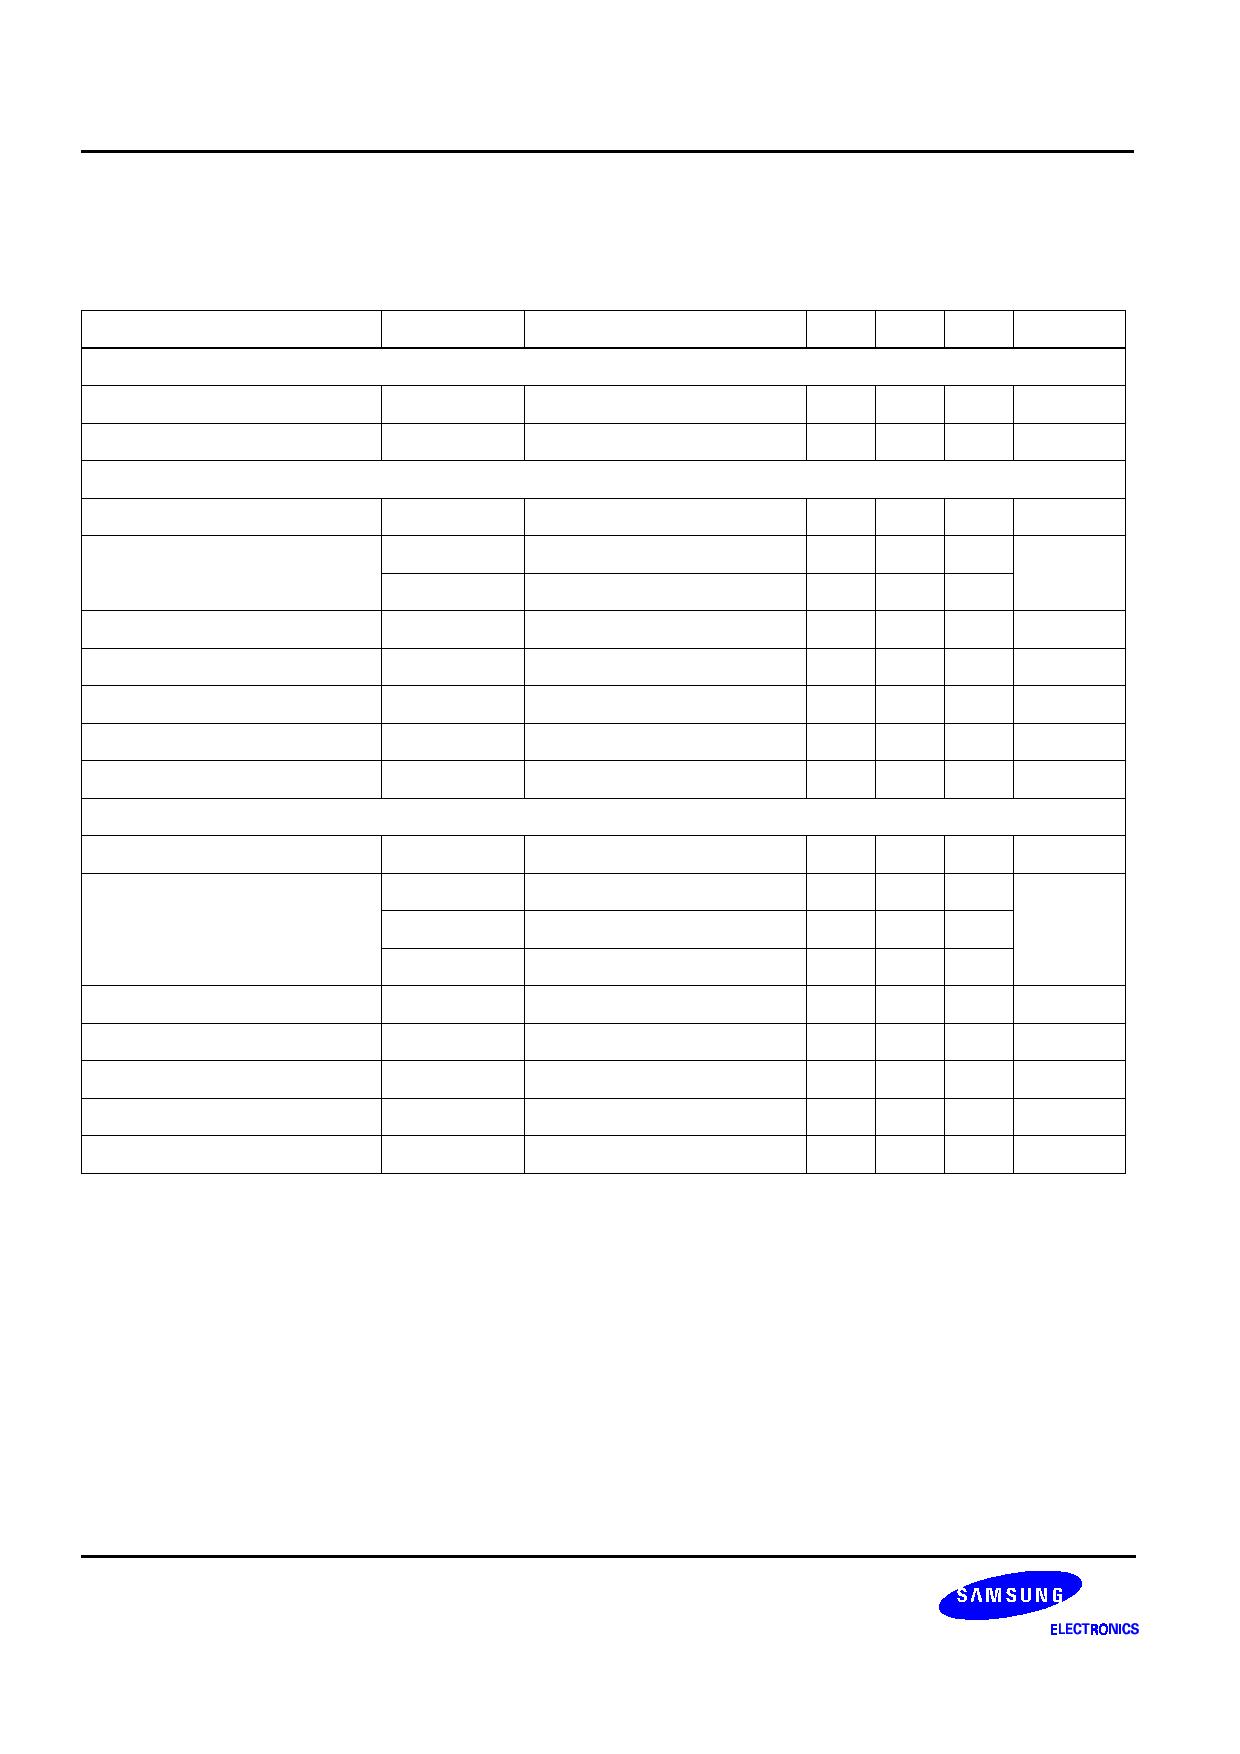 S1T8507C pdf, 전자부품, 반도체, 판매, 대치품